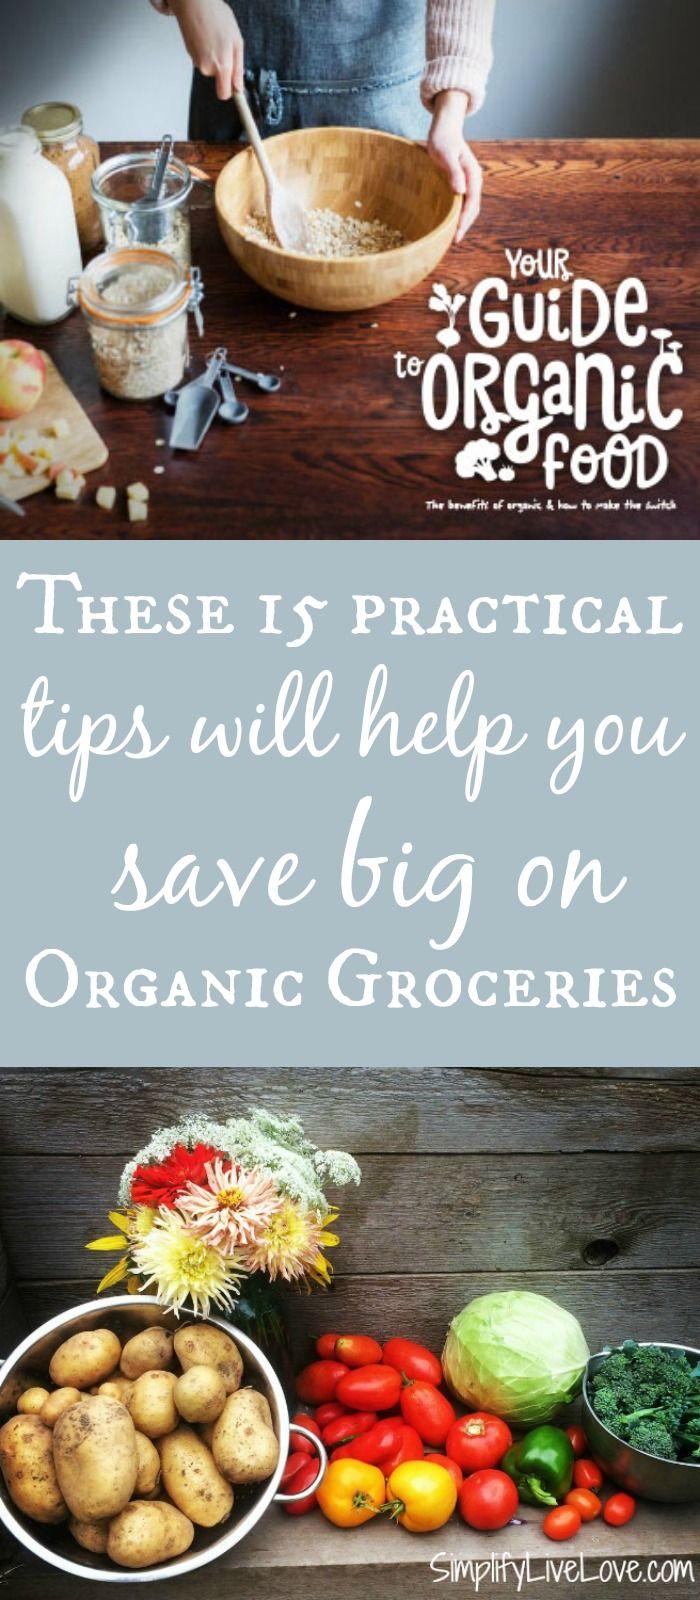 15 practical tips to help you save big on organic groceries. #alwaysorganic #ad